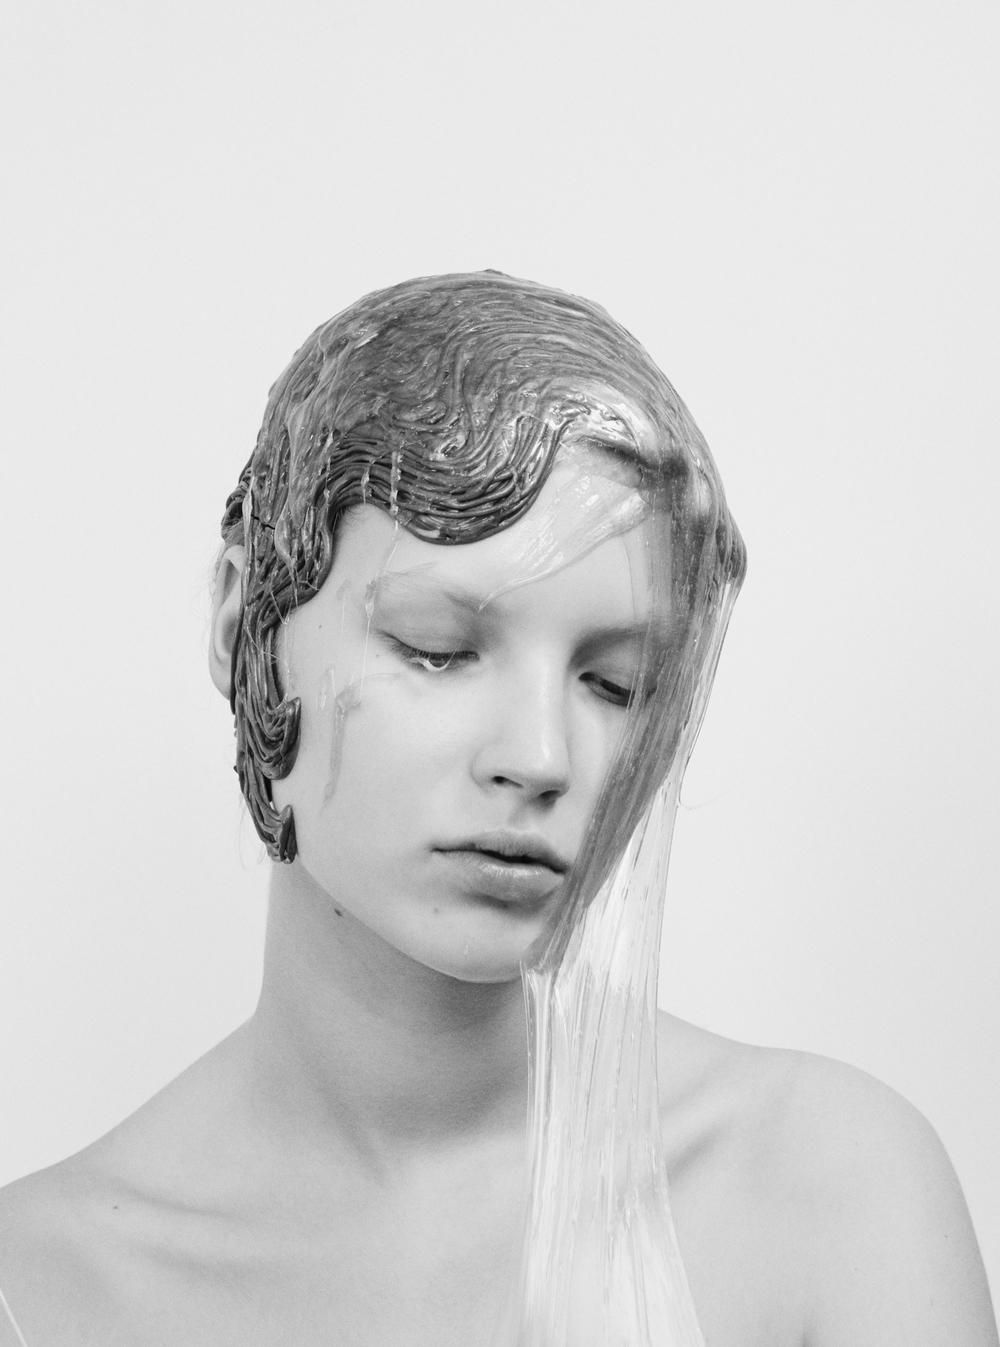 1a592-anabel-krasnotsvetova-by-julia-noni-for-beauty-papers-magazine-winter-2016-4.jpg